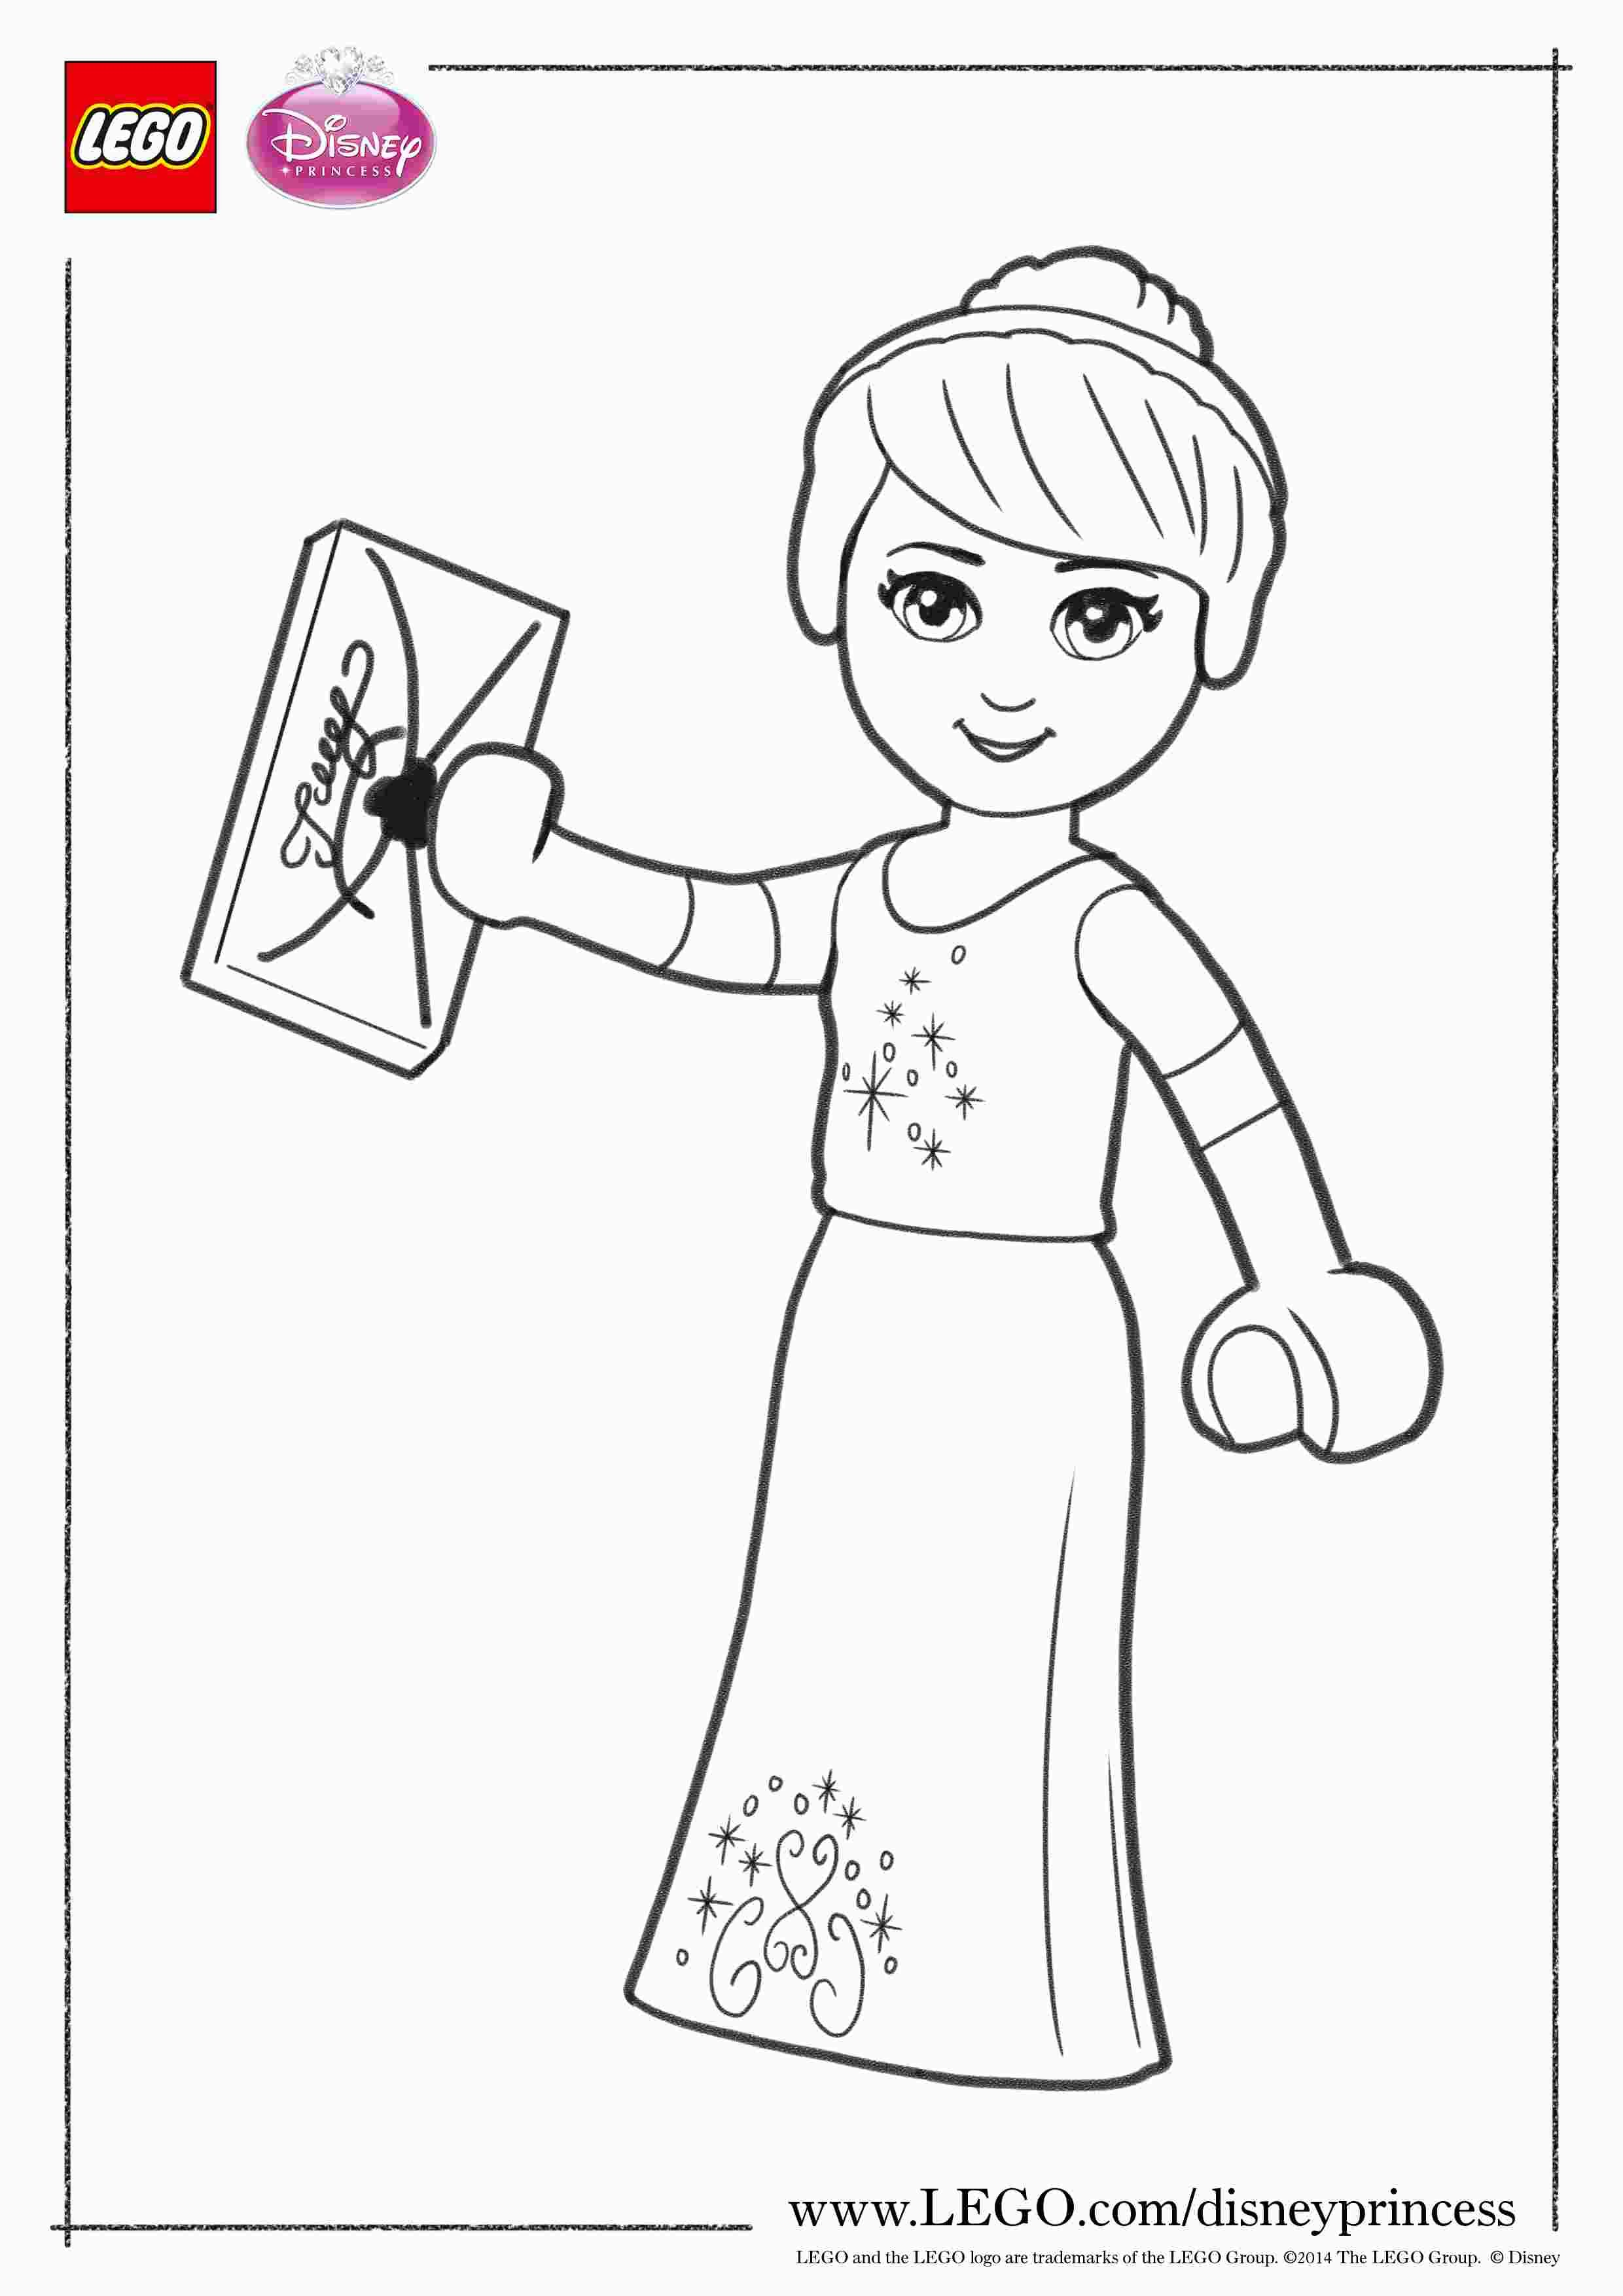 Lego Disney Princess Coloring Pages Lego Kleurplaten Prinses Kleurplaatjes Disney Prinsessen